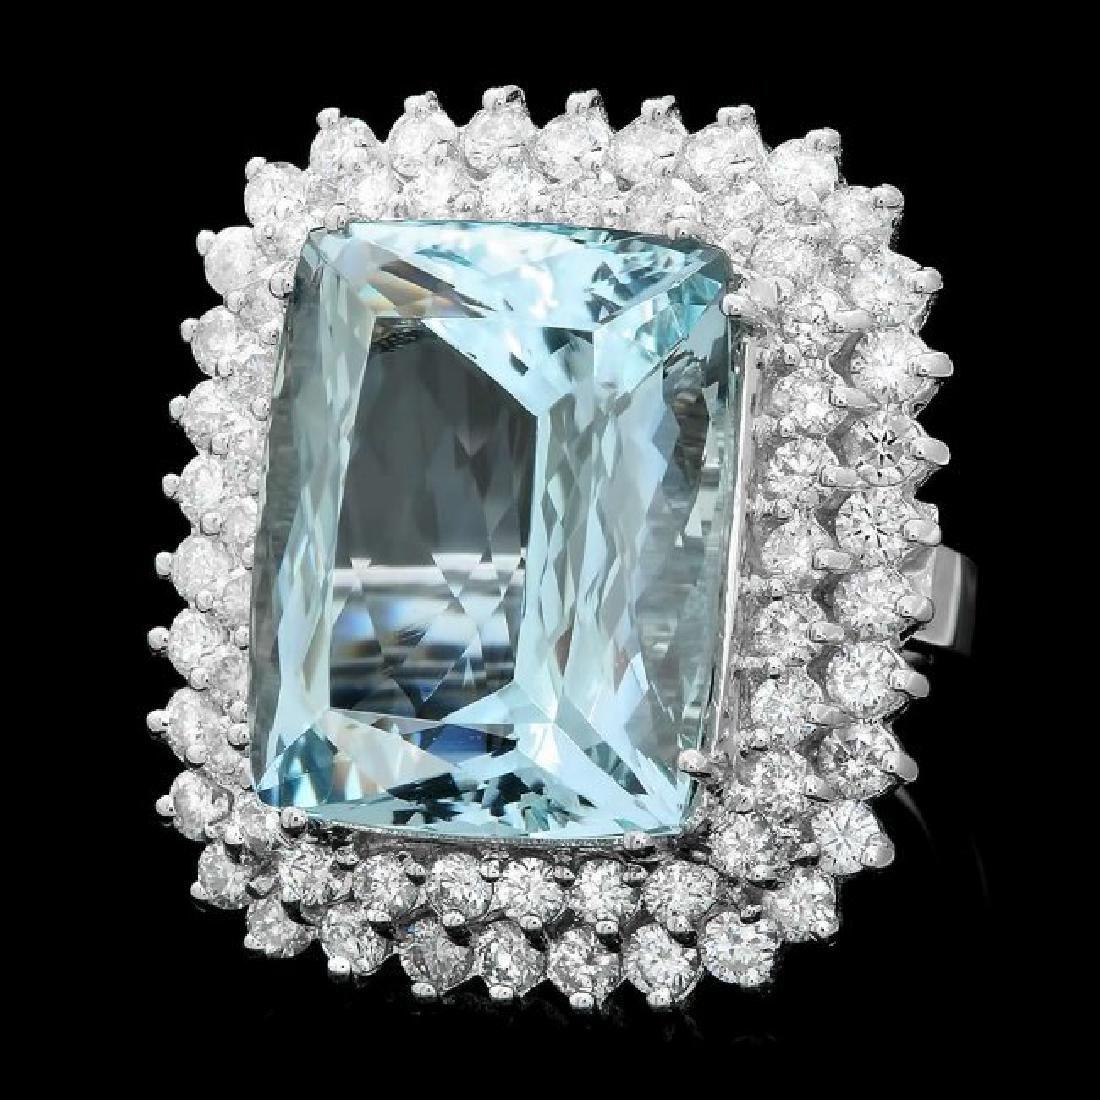 14k Gold 21.00ct Aquamarine 3.00ct Diamond Ring